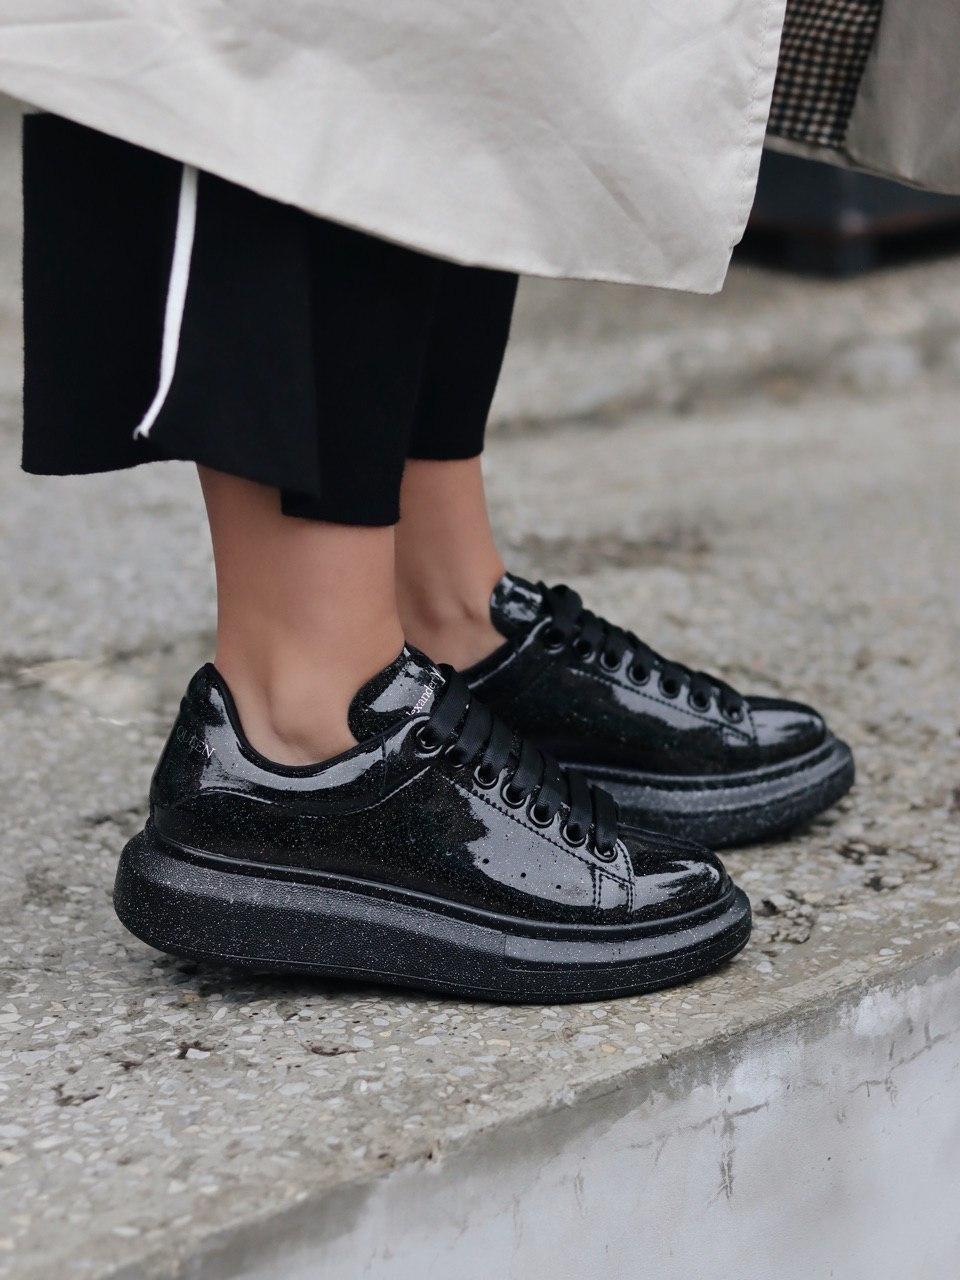 Стильны кроссовки Alexander McQueen (Александр Маквин) Black Space LUX QUALITY